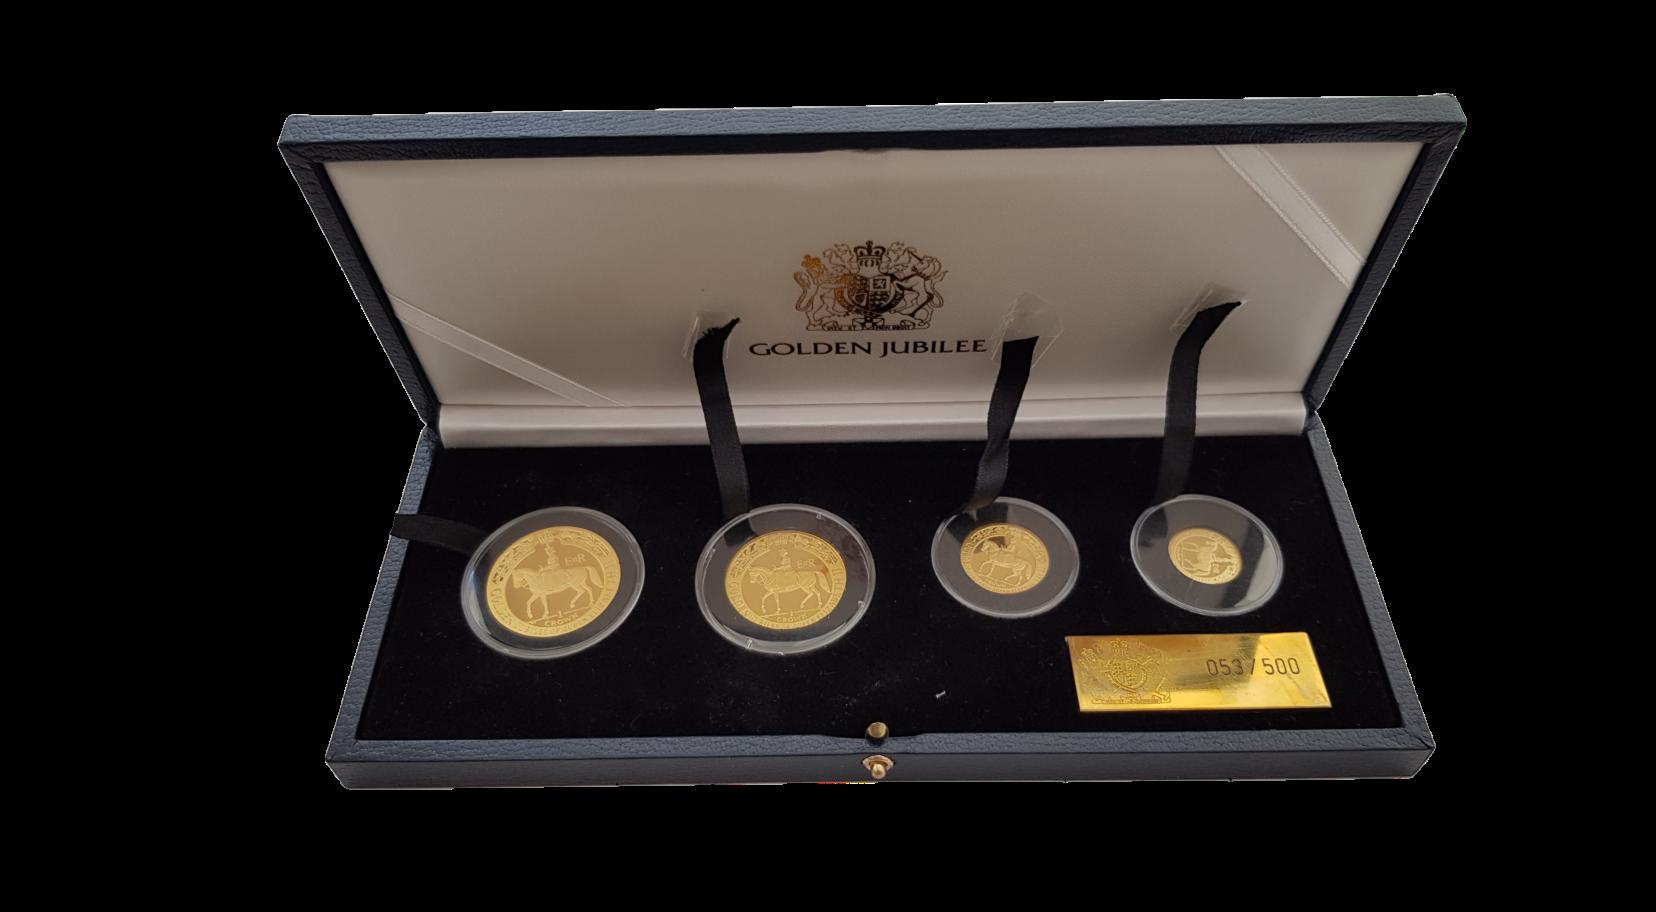 1 Set Goldmünzen Isle of Man Golden Jubilee Proof mit Etui und Zertifikat Jahrgang 2002